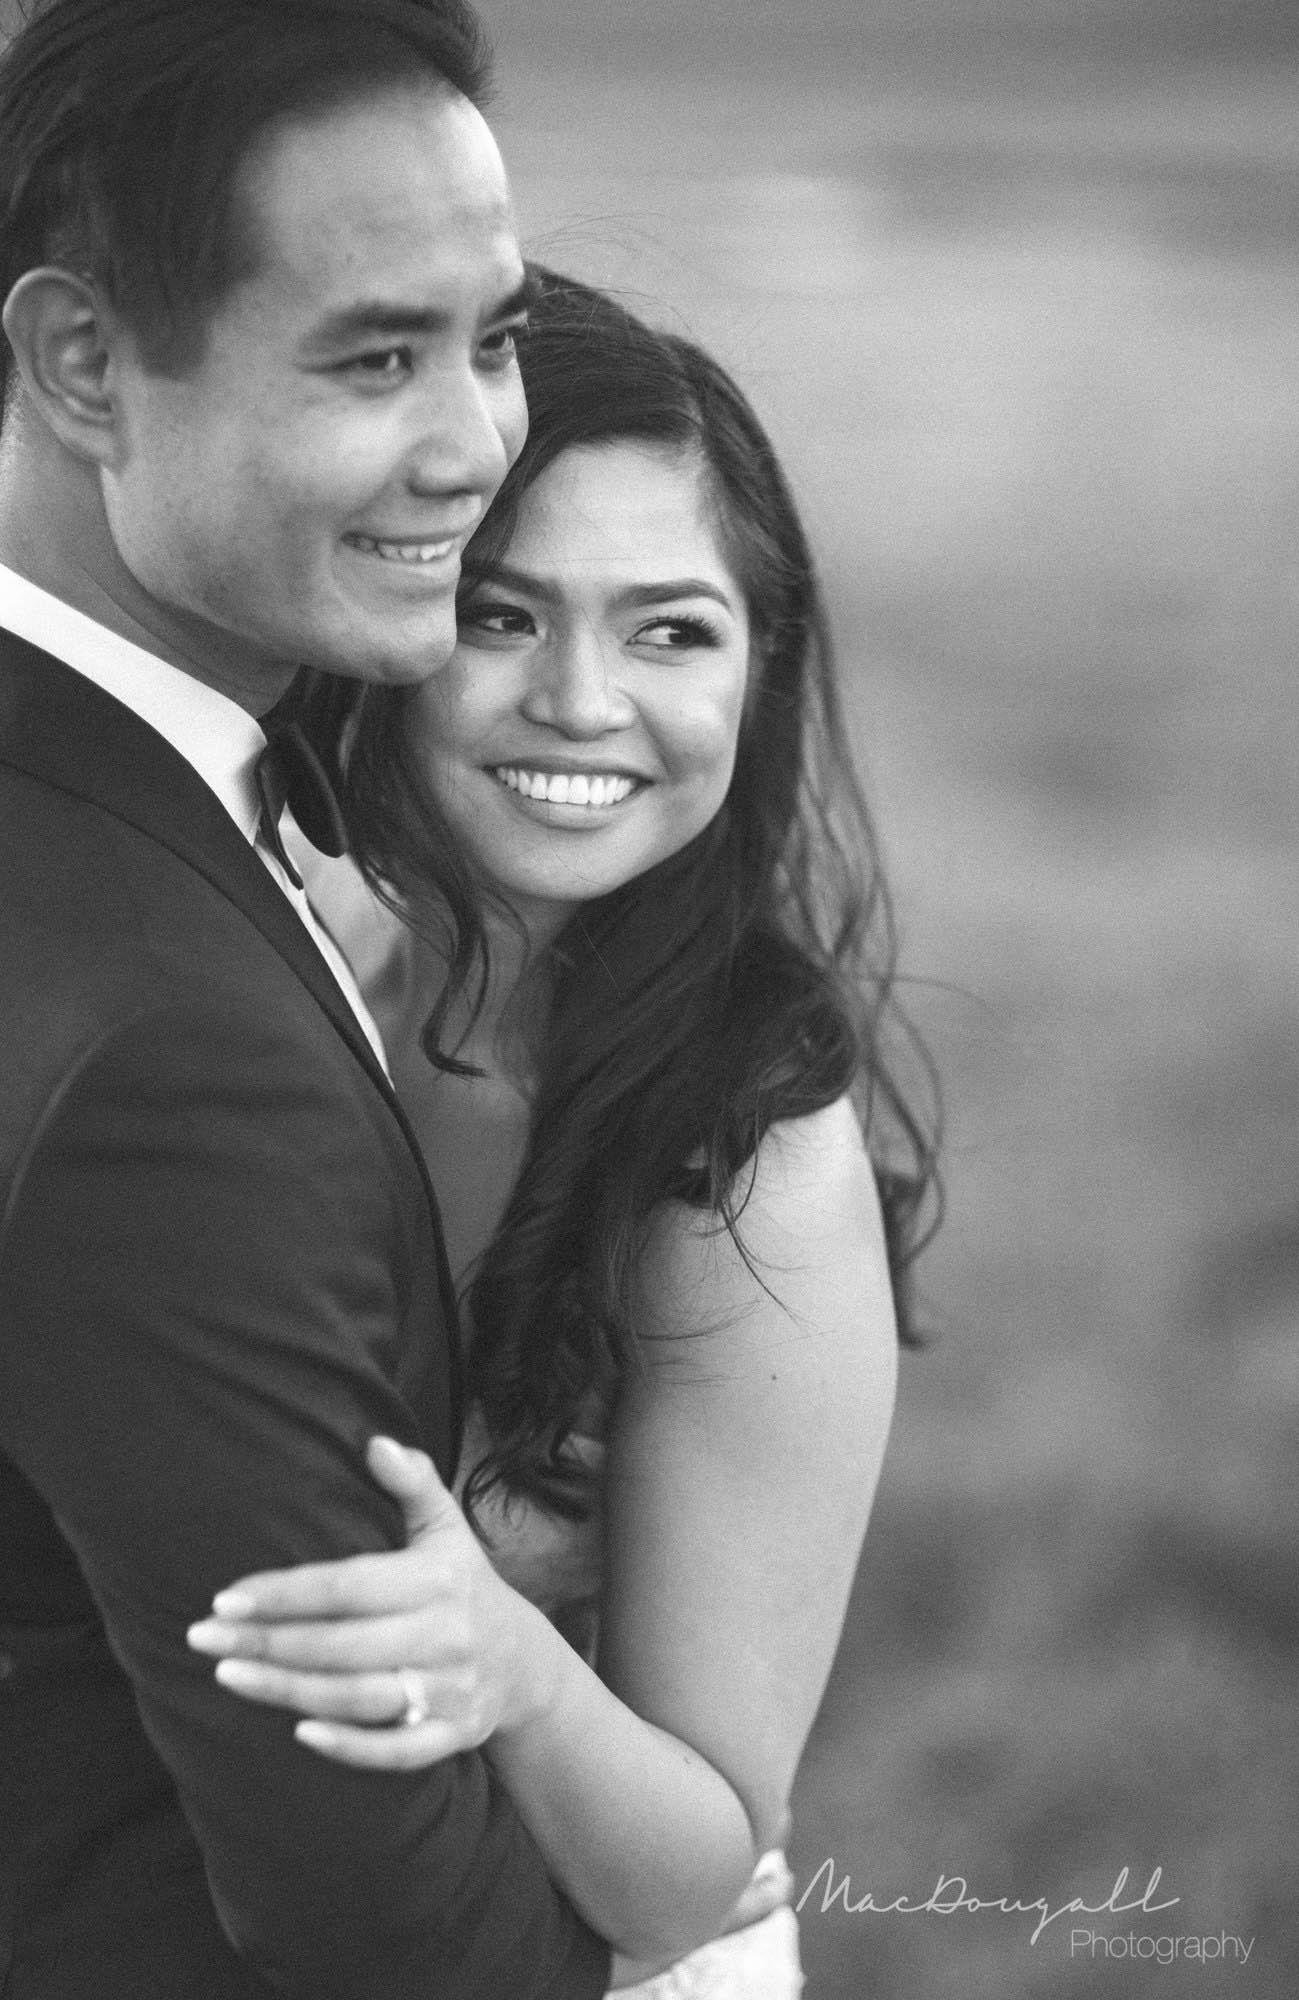 MacDougall-Photography-Sydney-Wedding-Photographers-11.jpg